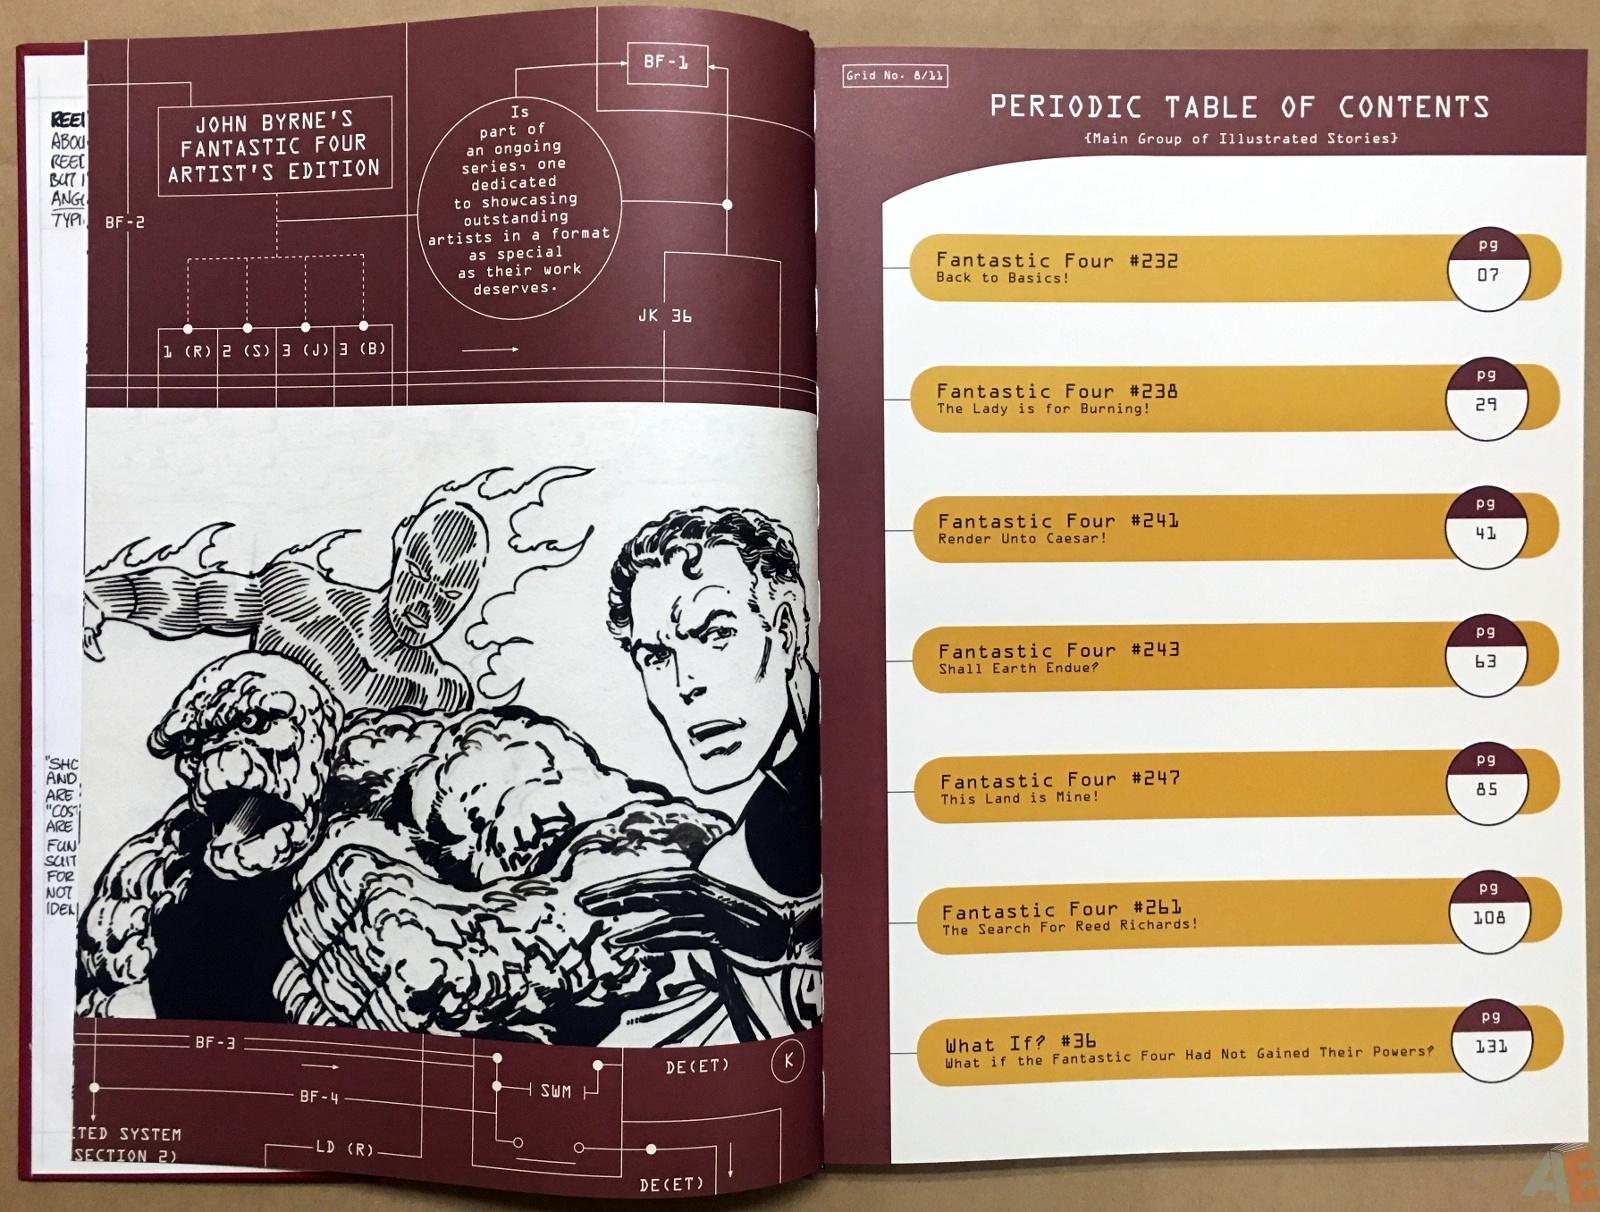 John Byrne's The Fantastic Four Artist's Edition 6